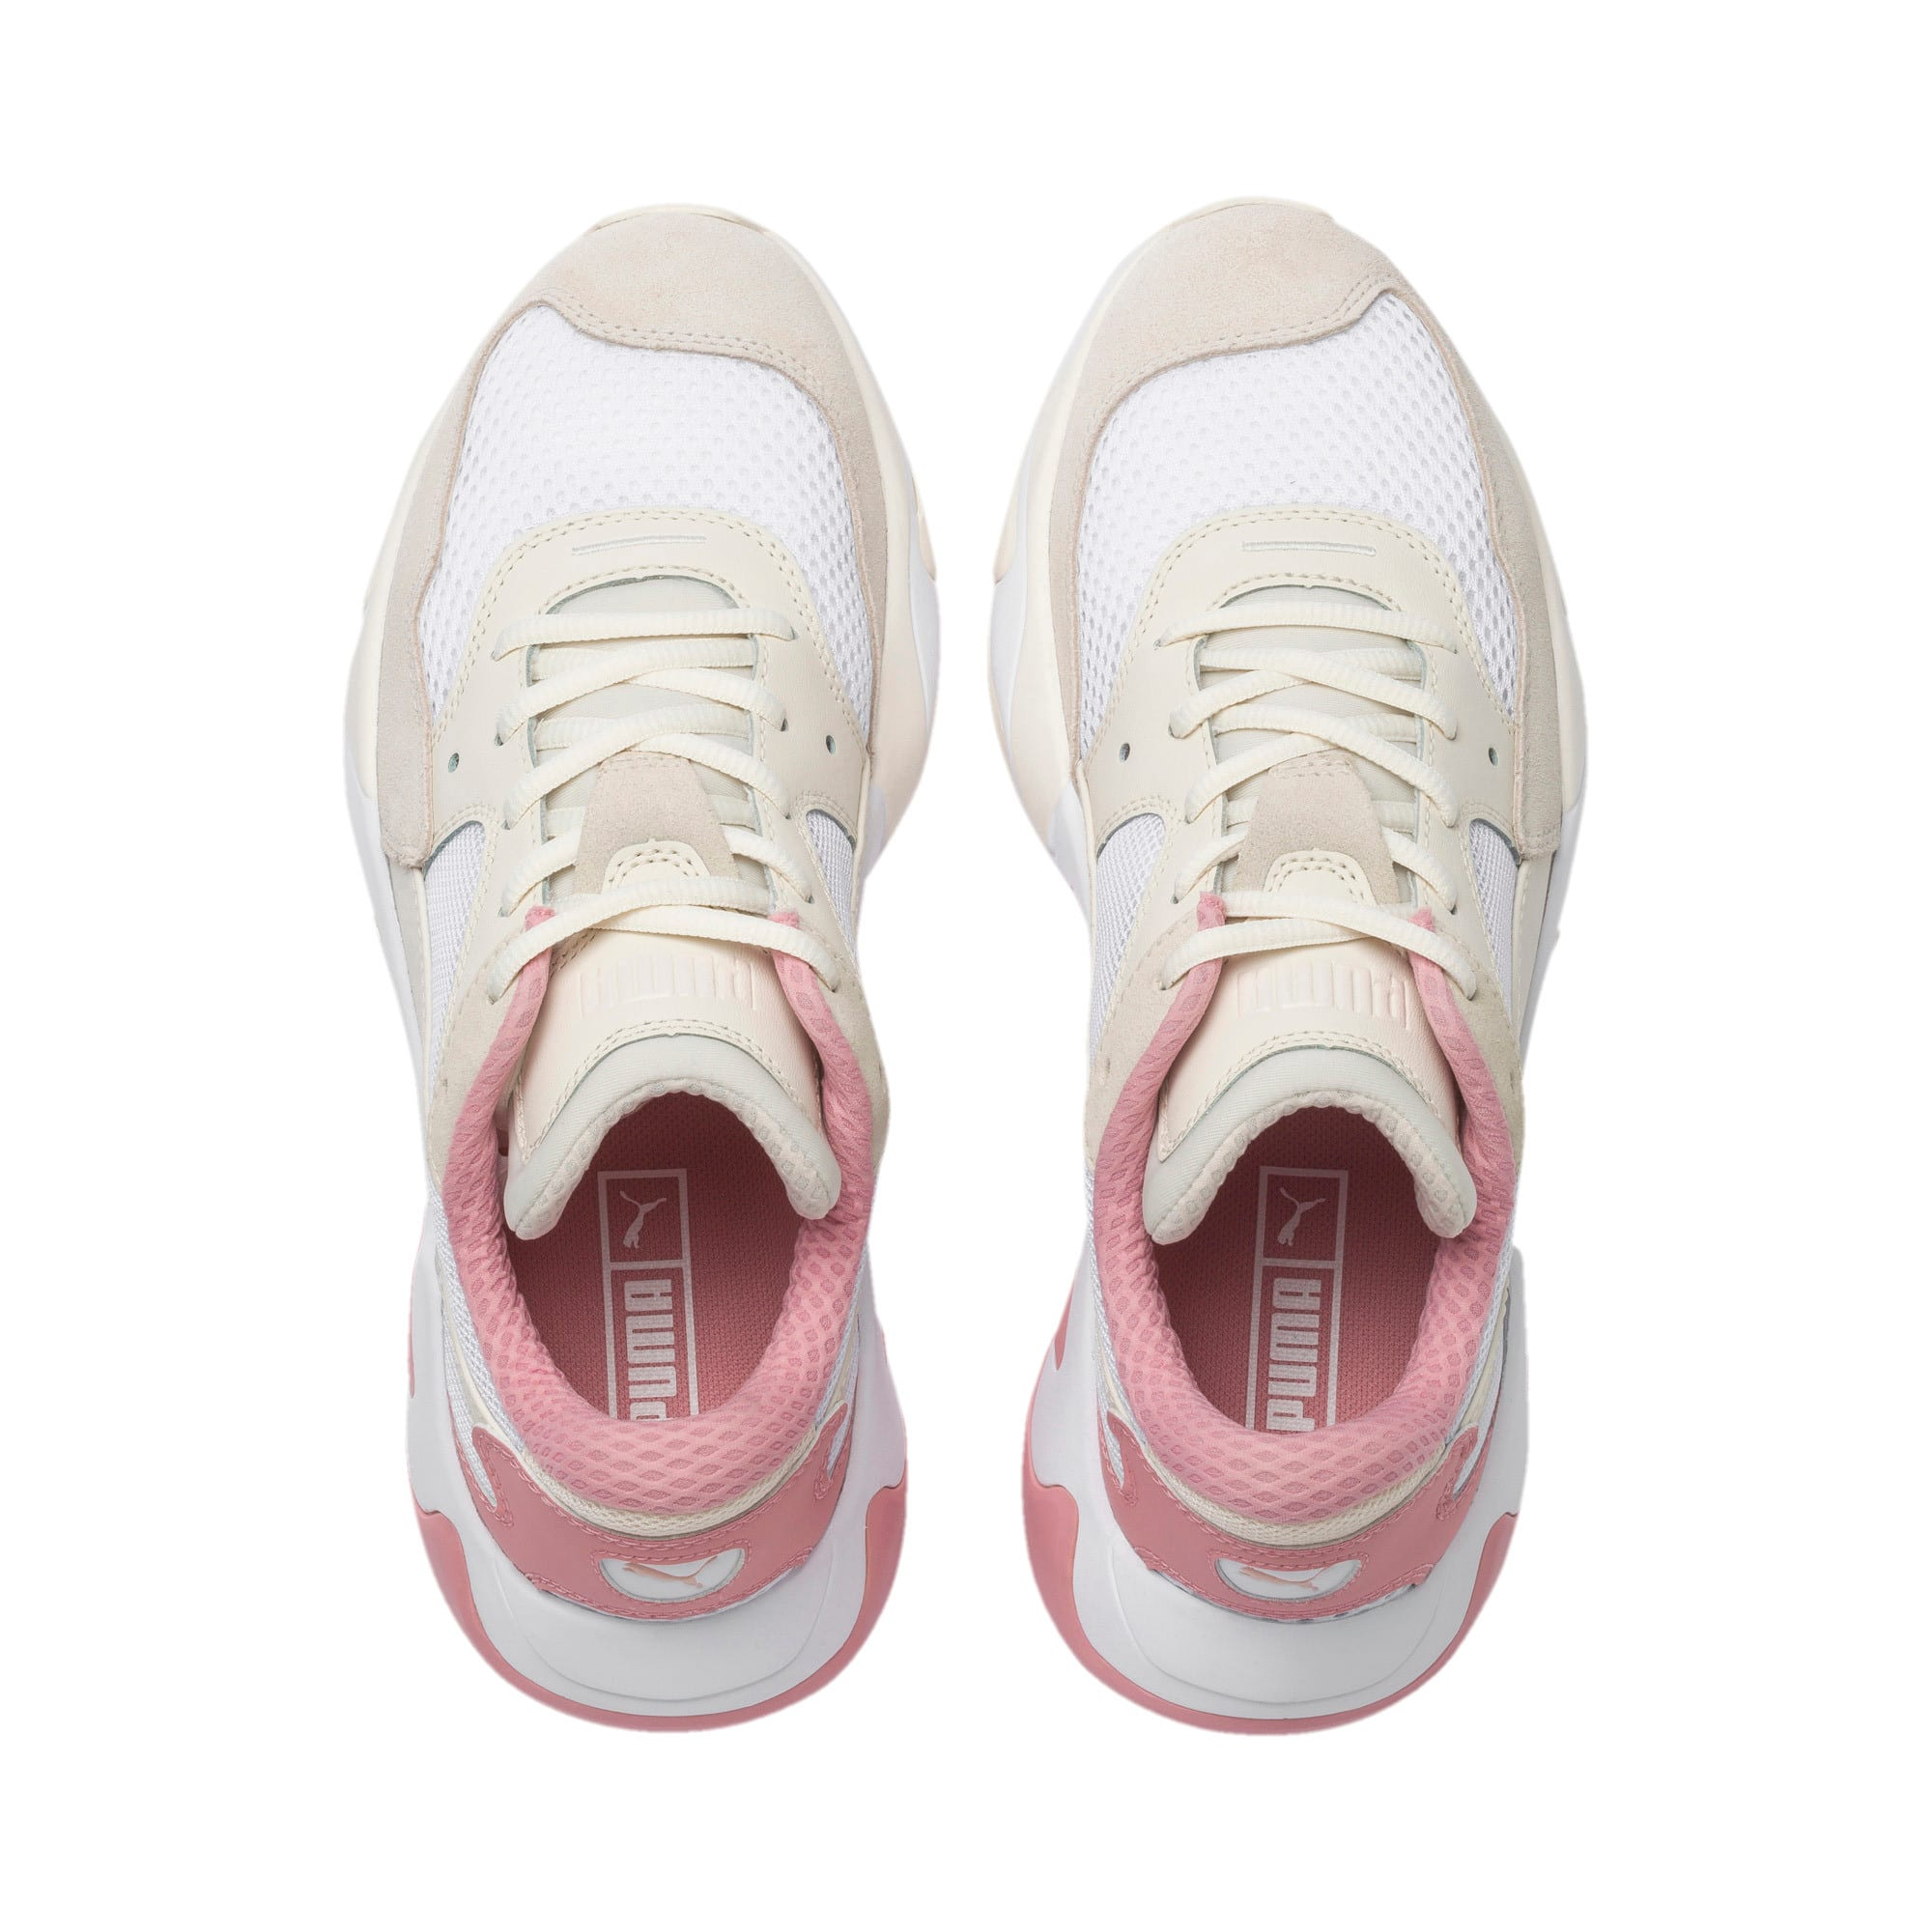 Thumbnail 7 of ストーム オリジン スニーカー, Pastel Parchment-Puma White, medium-JPN